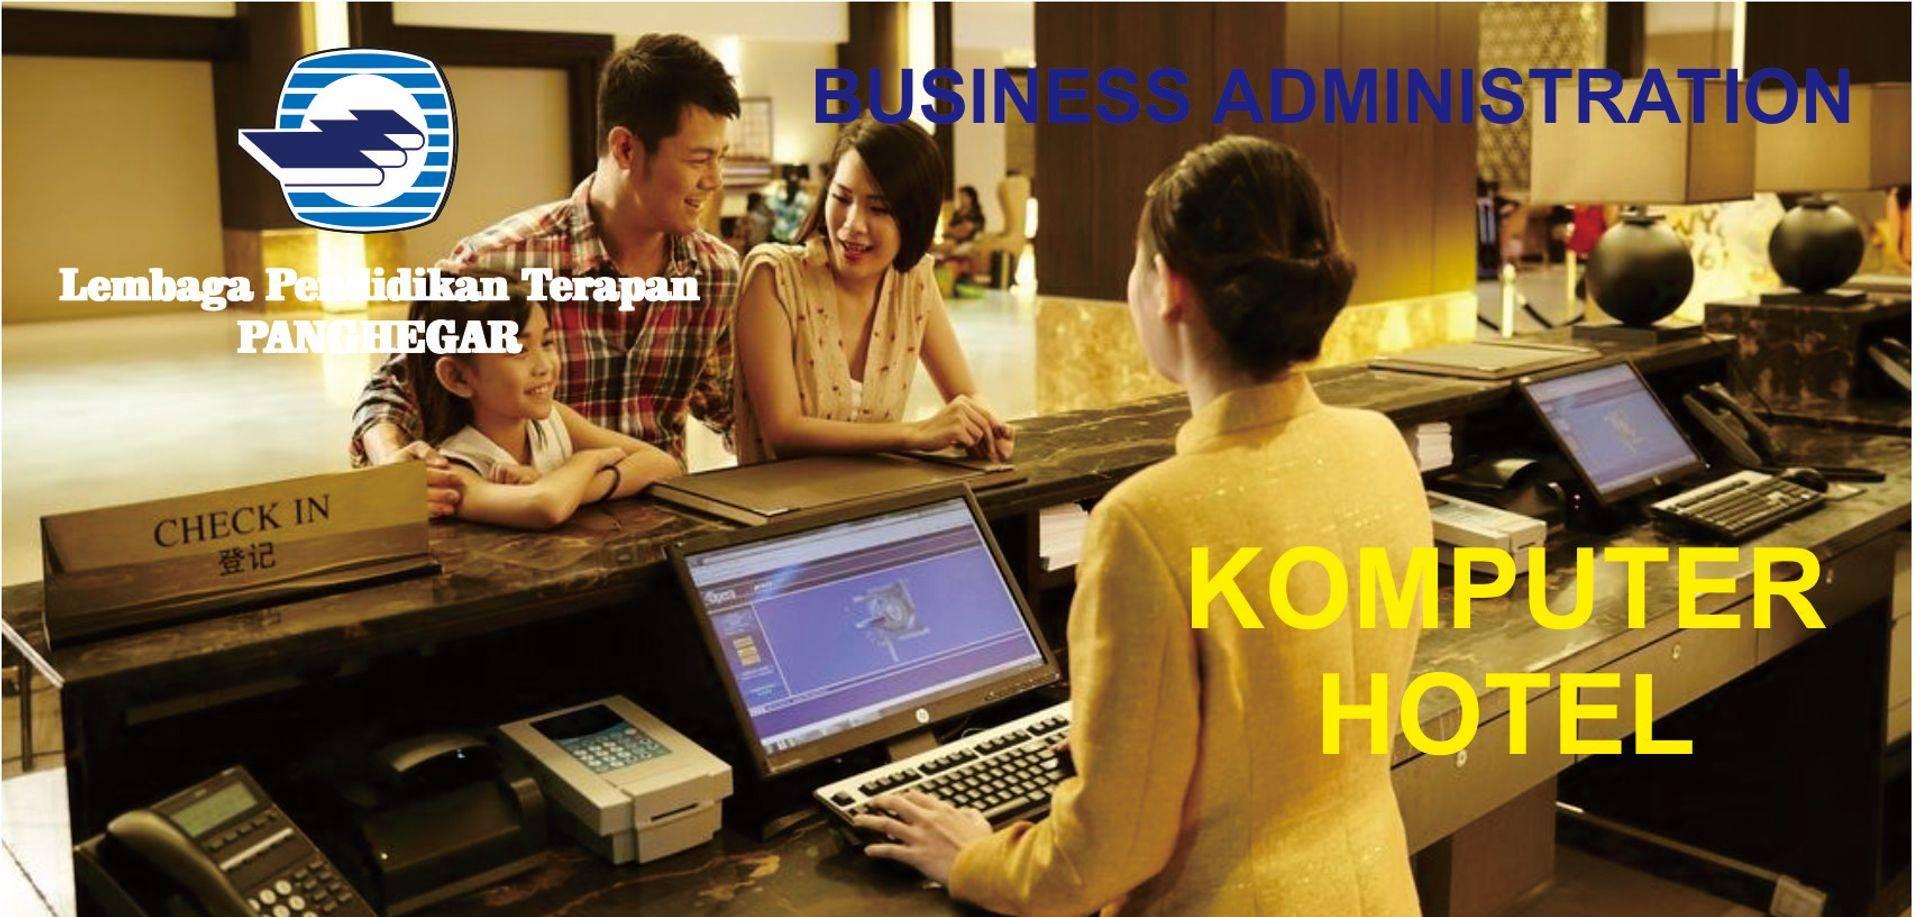 Komputer Hotel